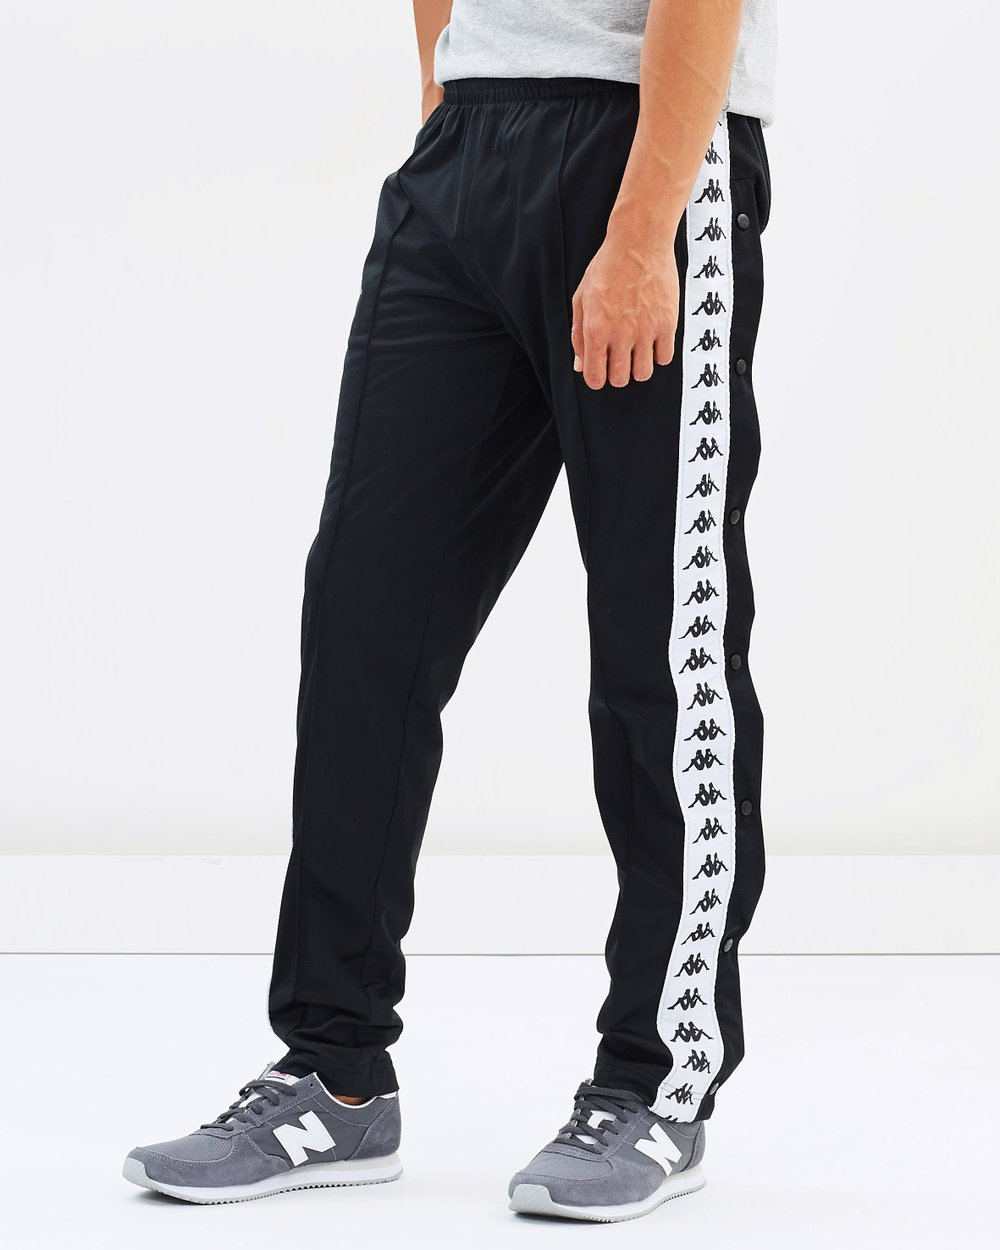 76a0205385d0 Banda Astoria Snap Pants by Kappa Online